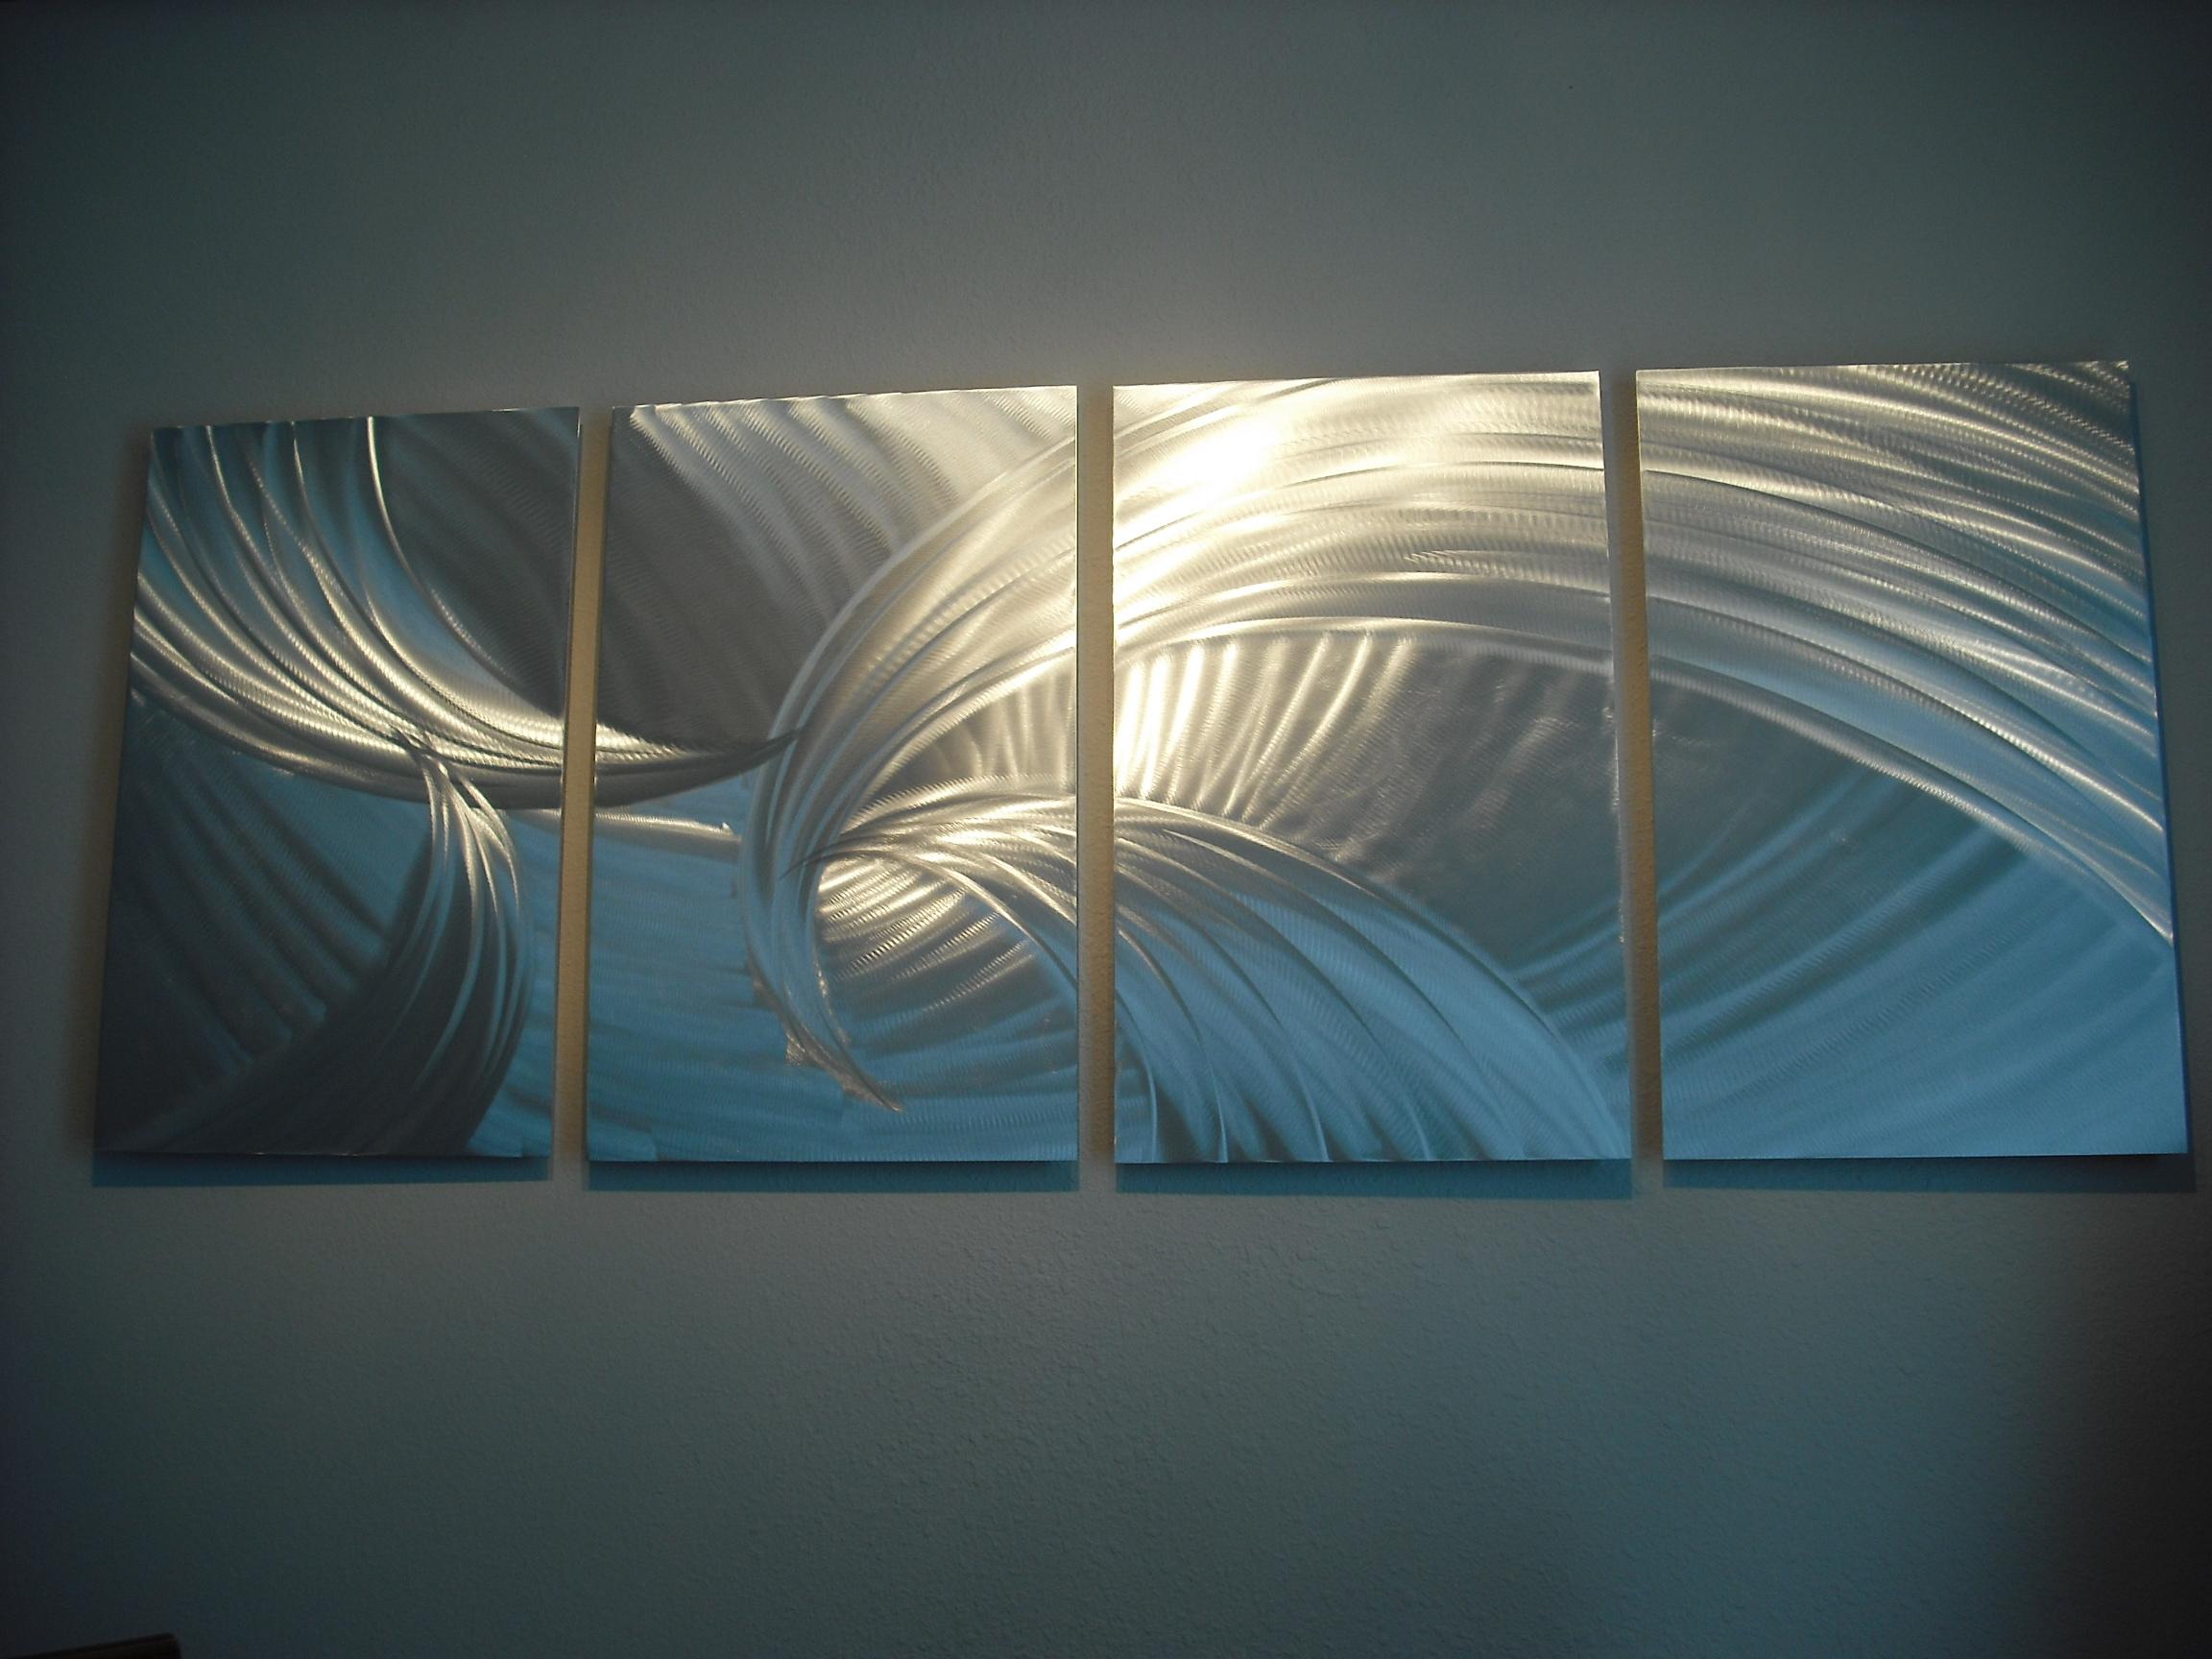 Contemporary Modern Decor Original Tempest Browns Abstract Metal Wall Art